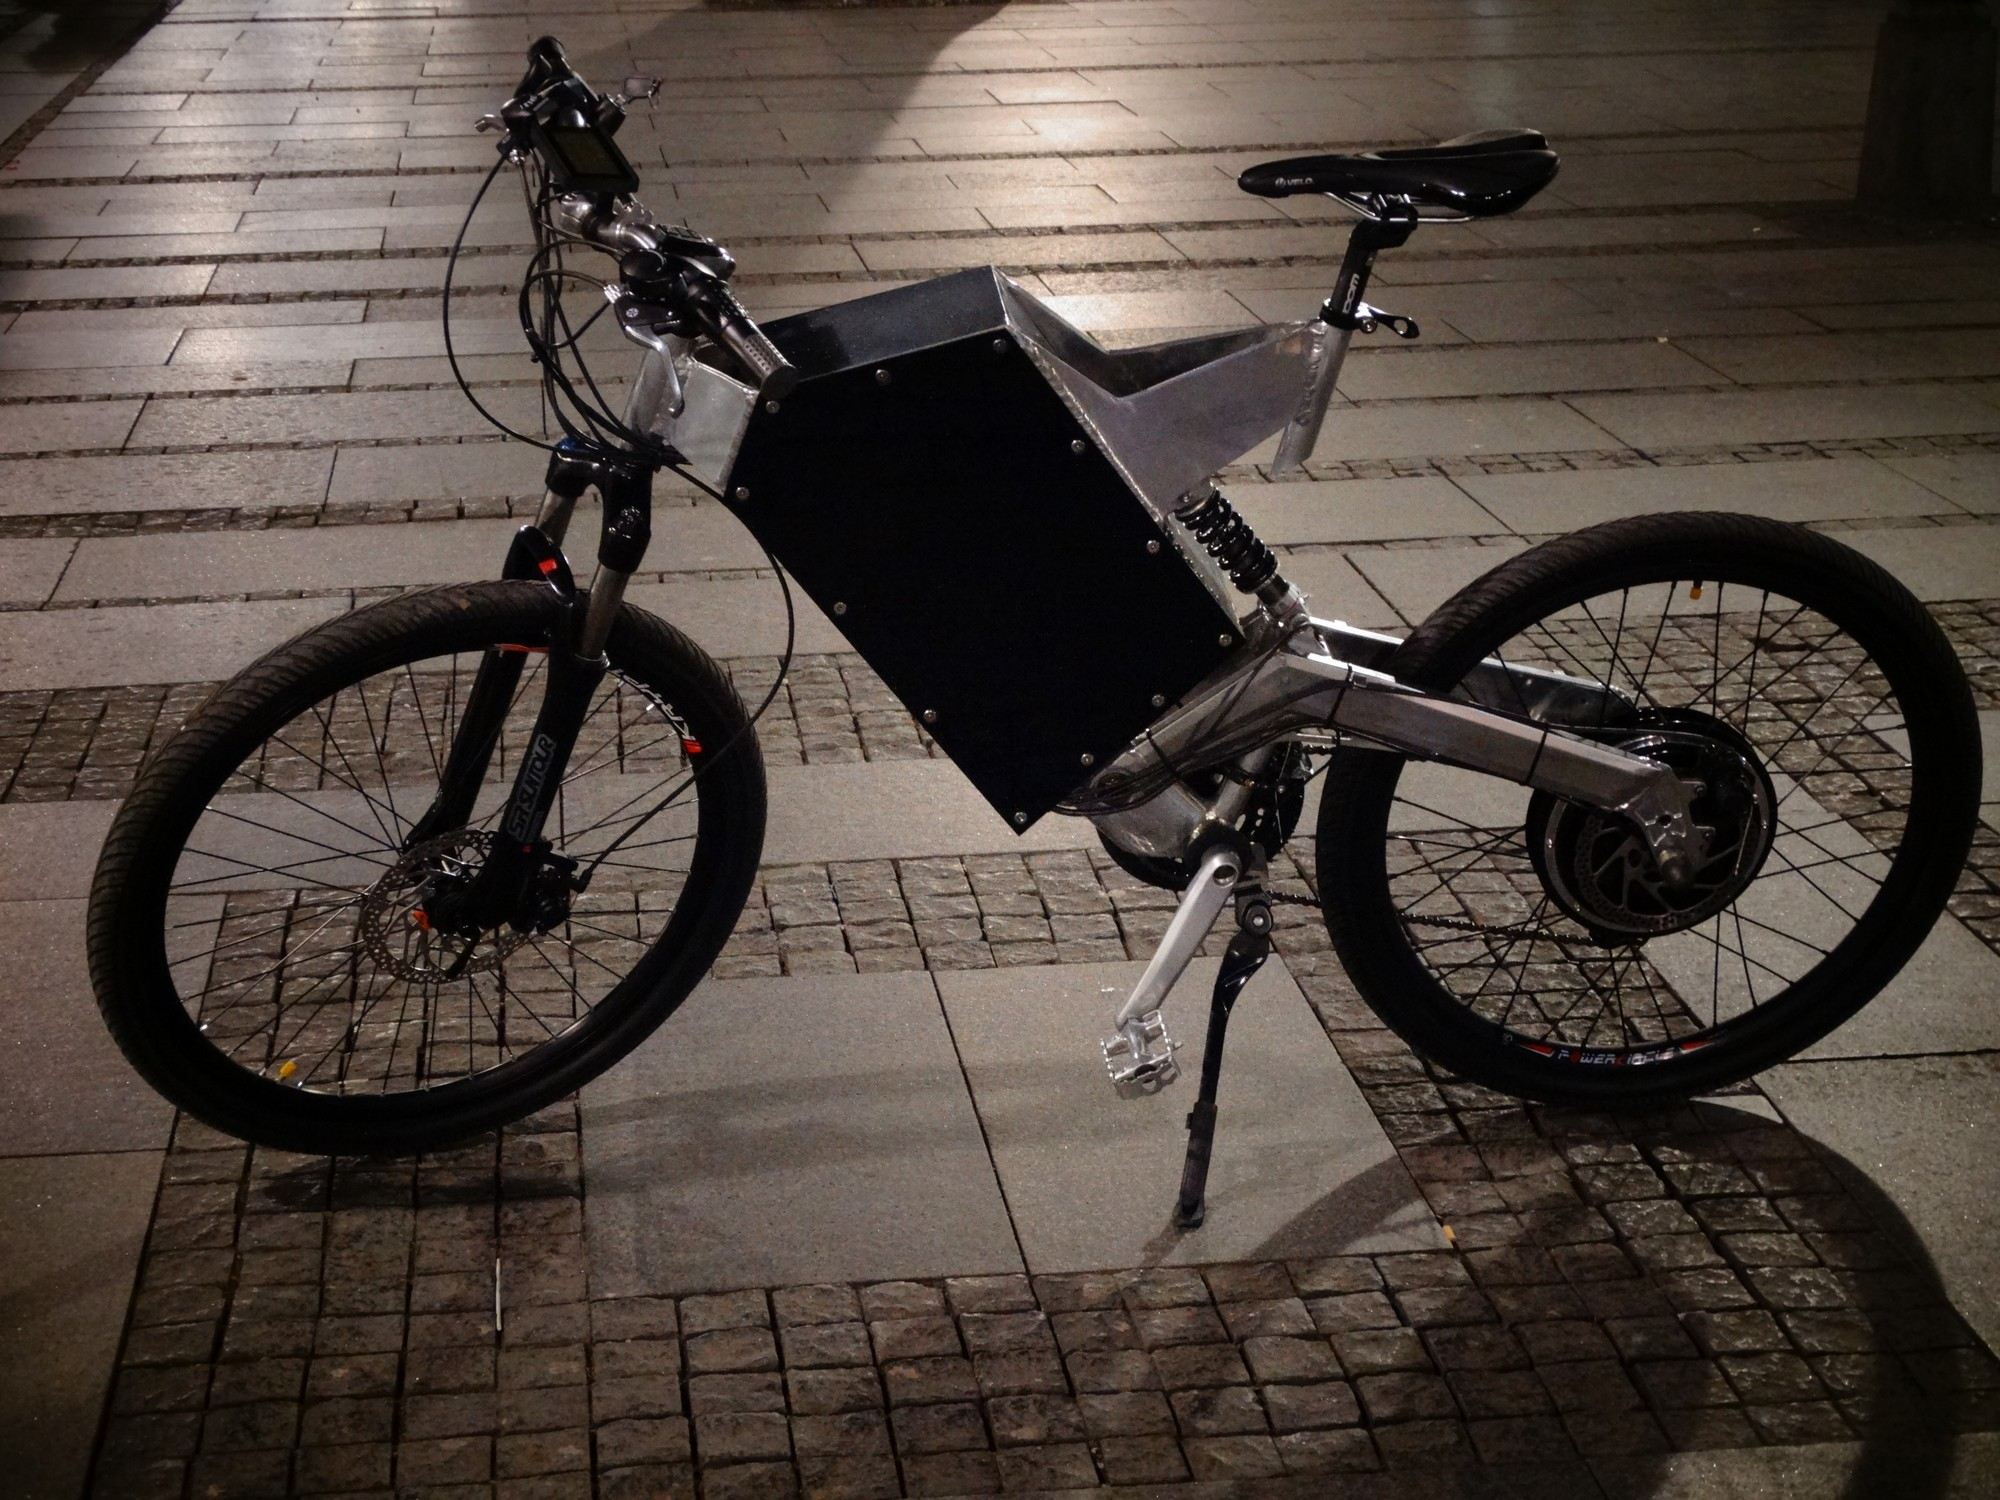 e-prime-electric-bicycle-autonovosti.me-4